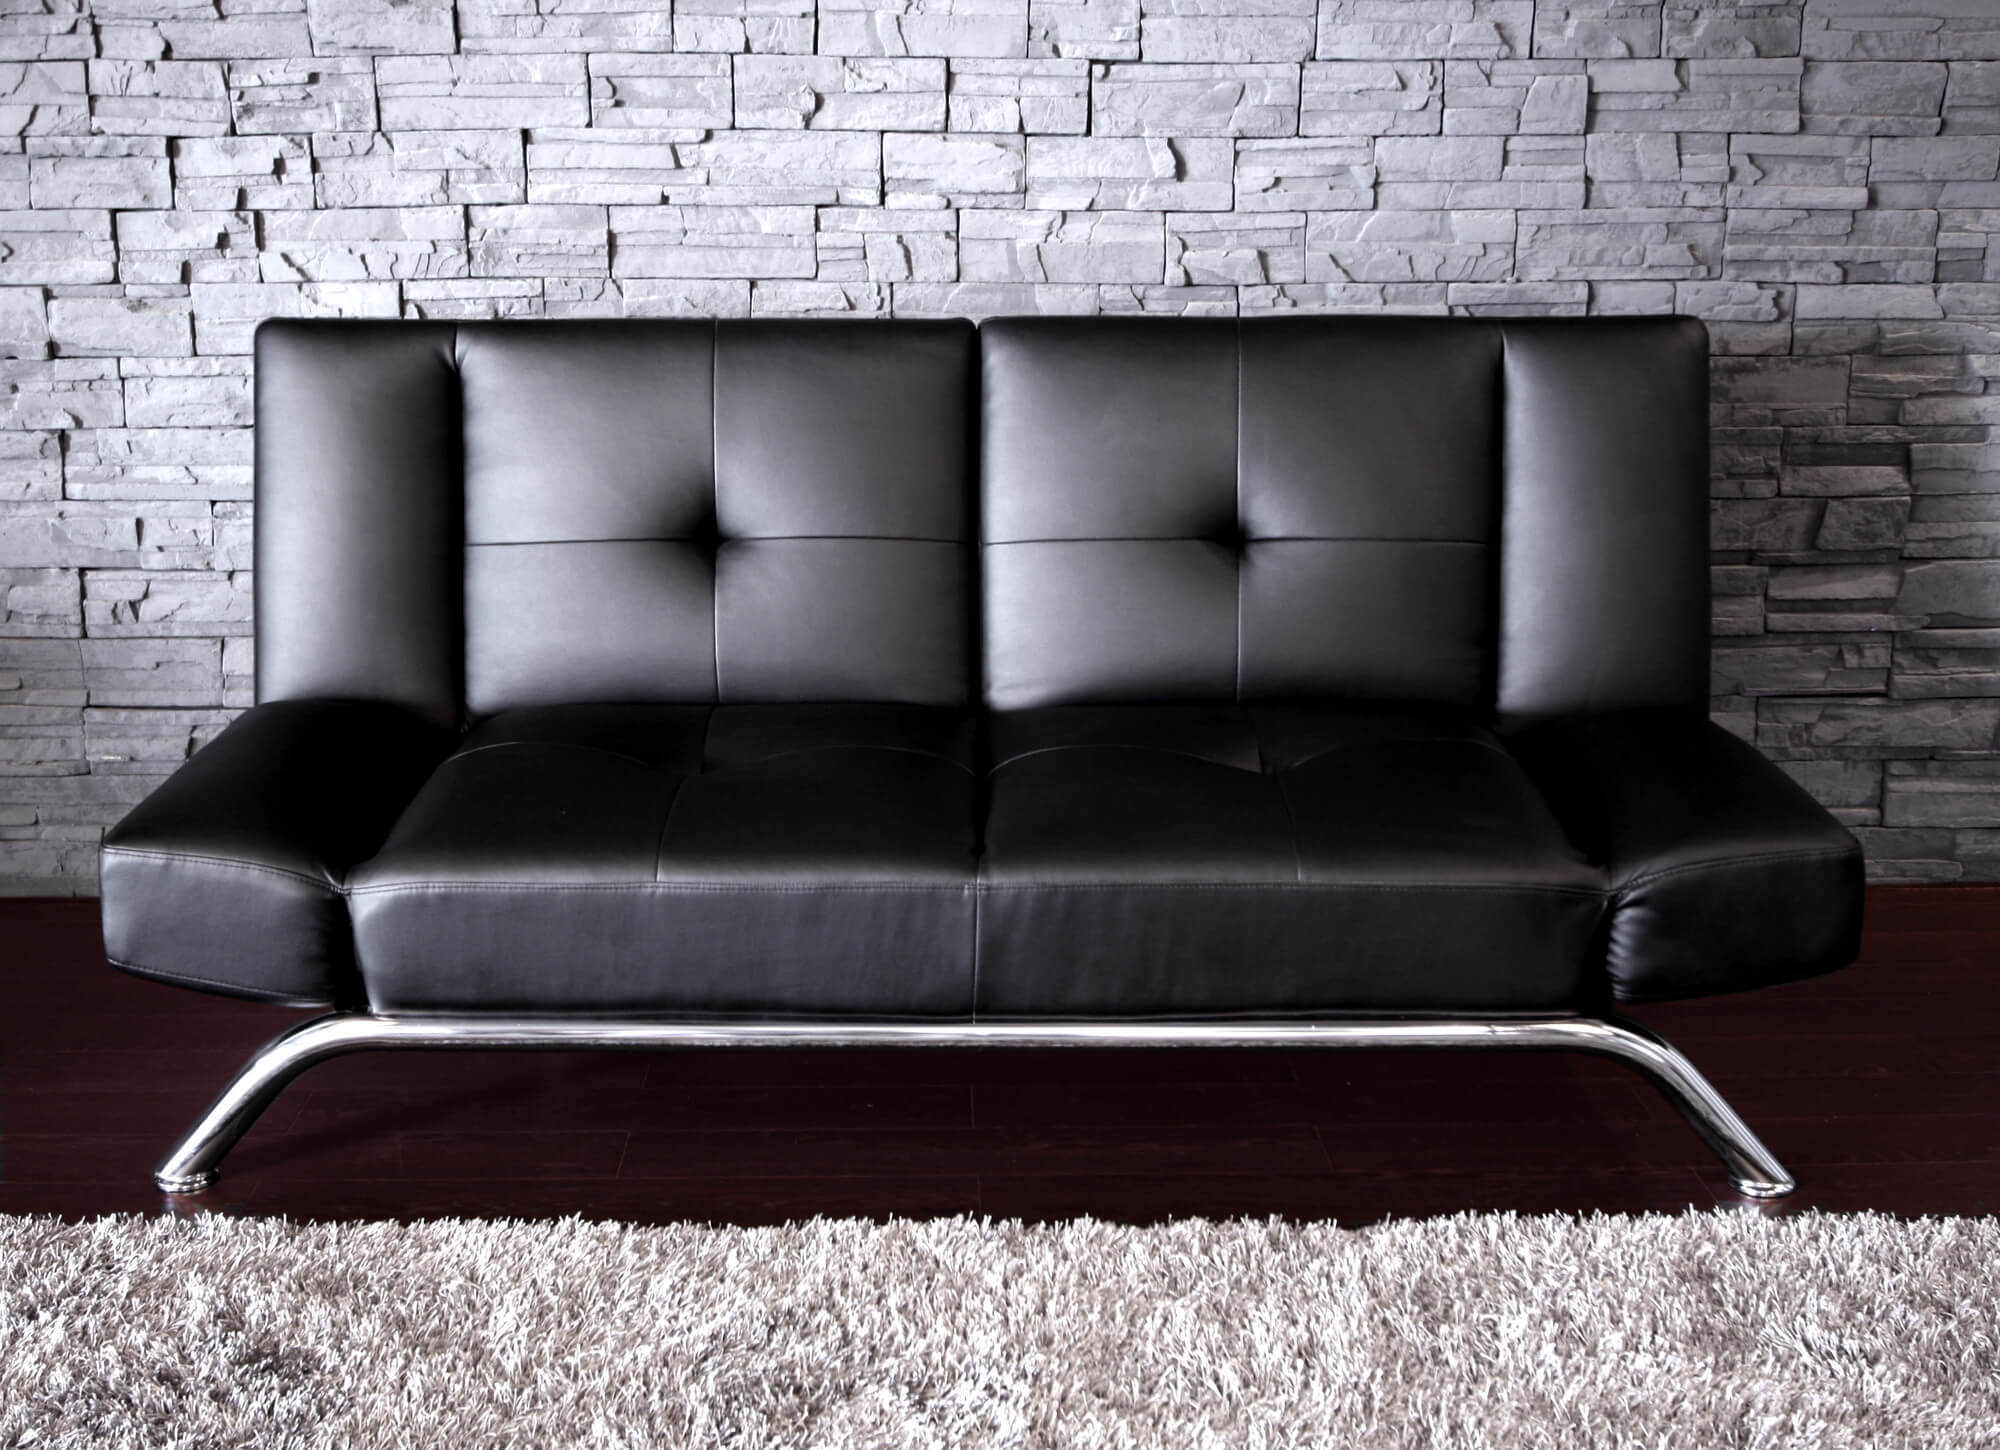 Metal leather contemporary futon